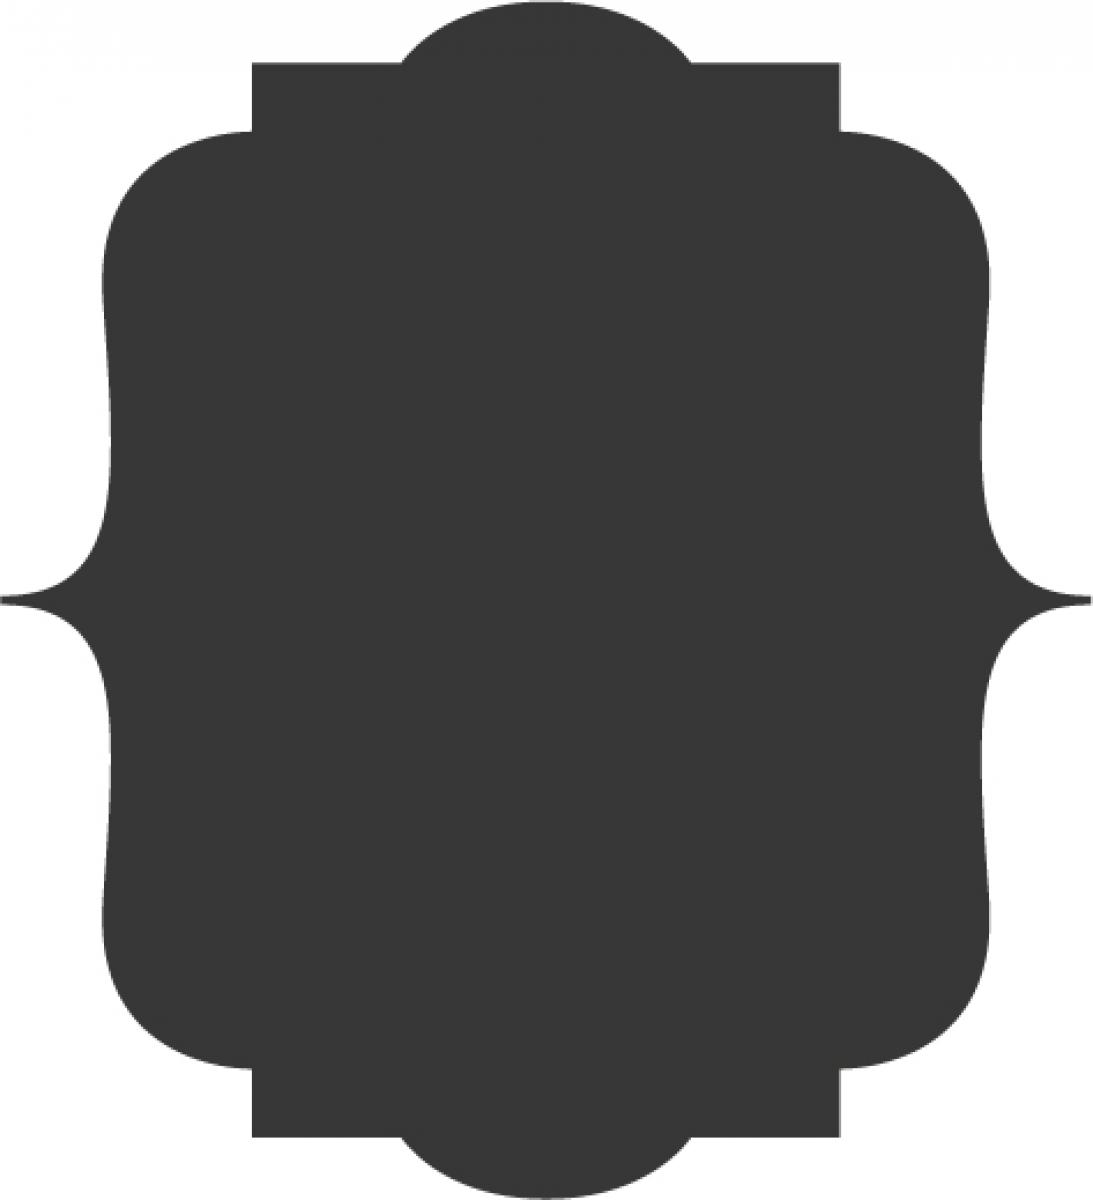 Come Pulire Parete Lavagna adesivo lavagna cucina | cornice 5 | livingdeco'